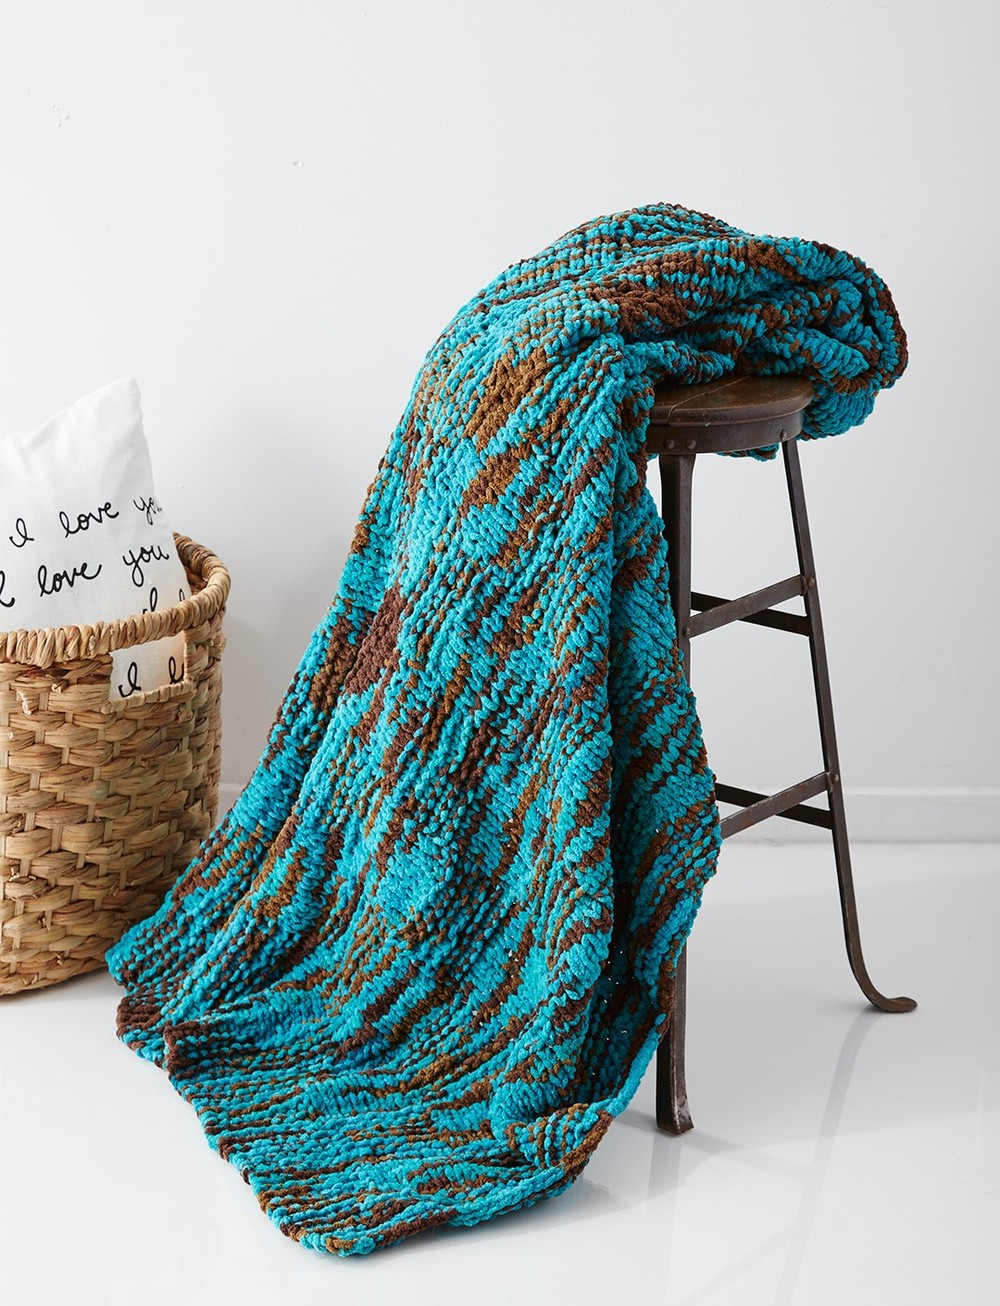 Seafoam Knit Throw AllFreeKnitting.com